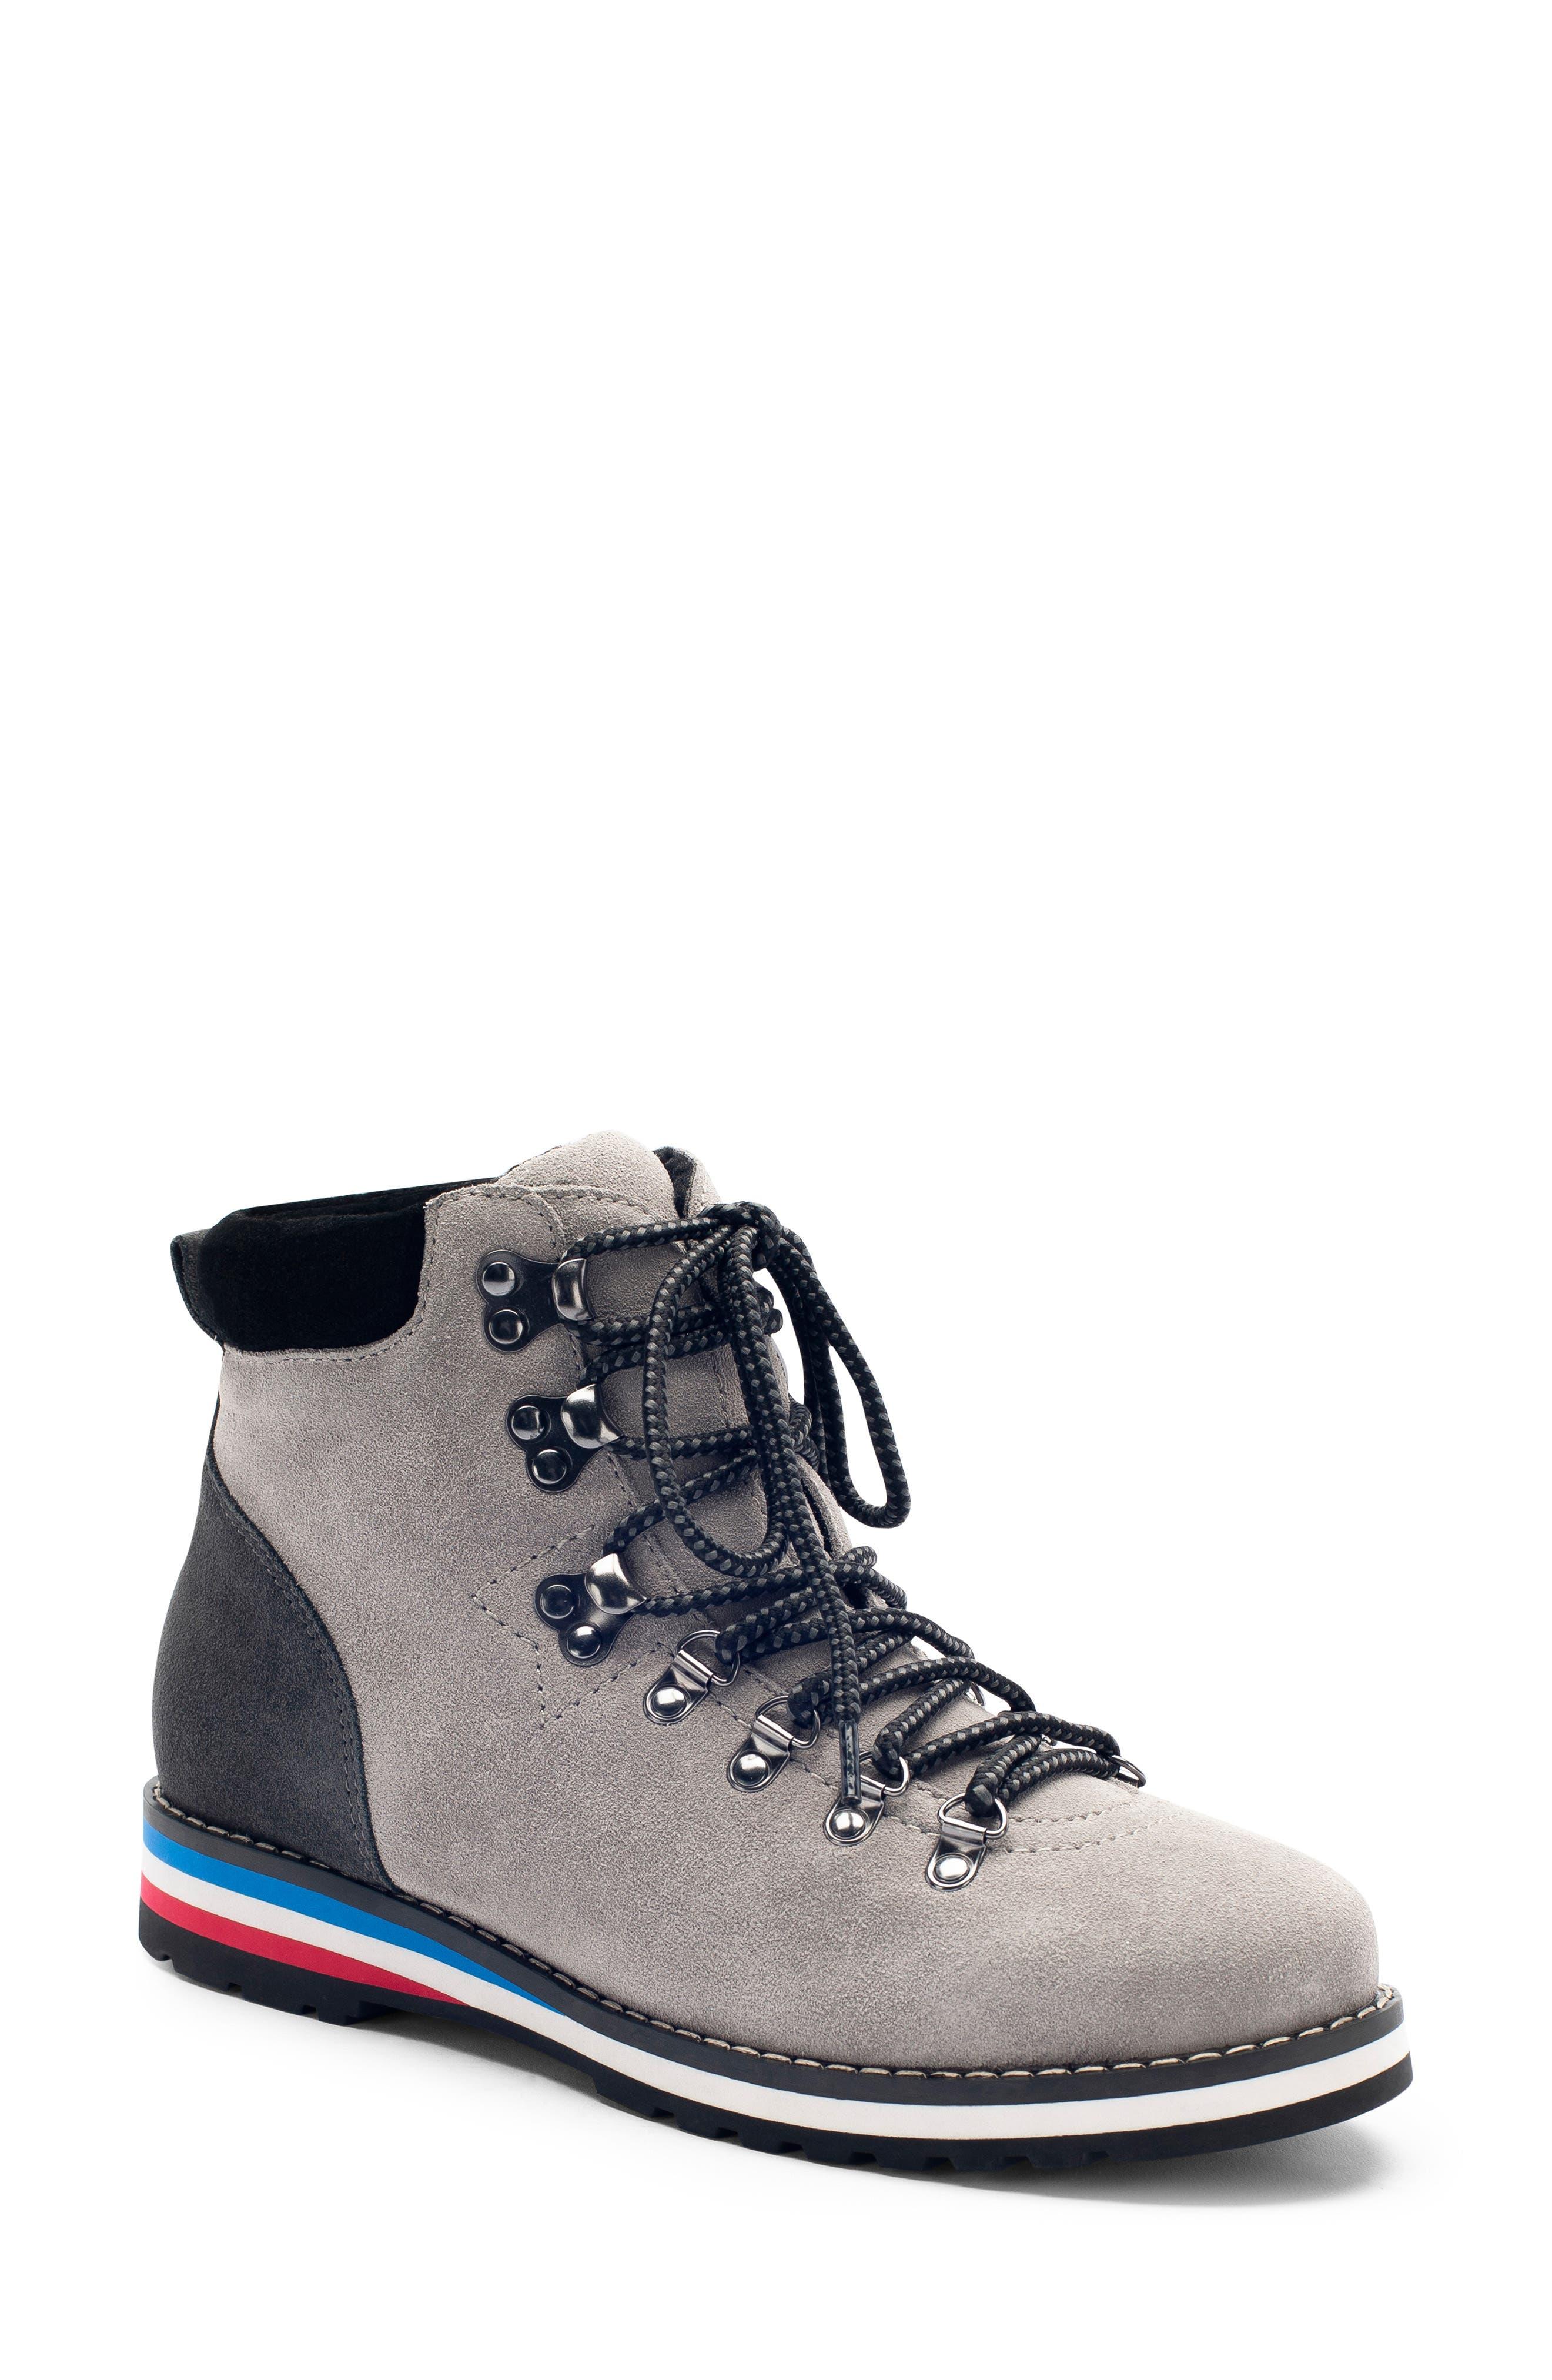 Blondo Regan Waterproof Boot, Grey